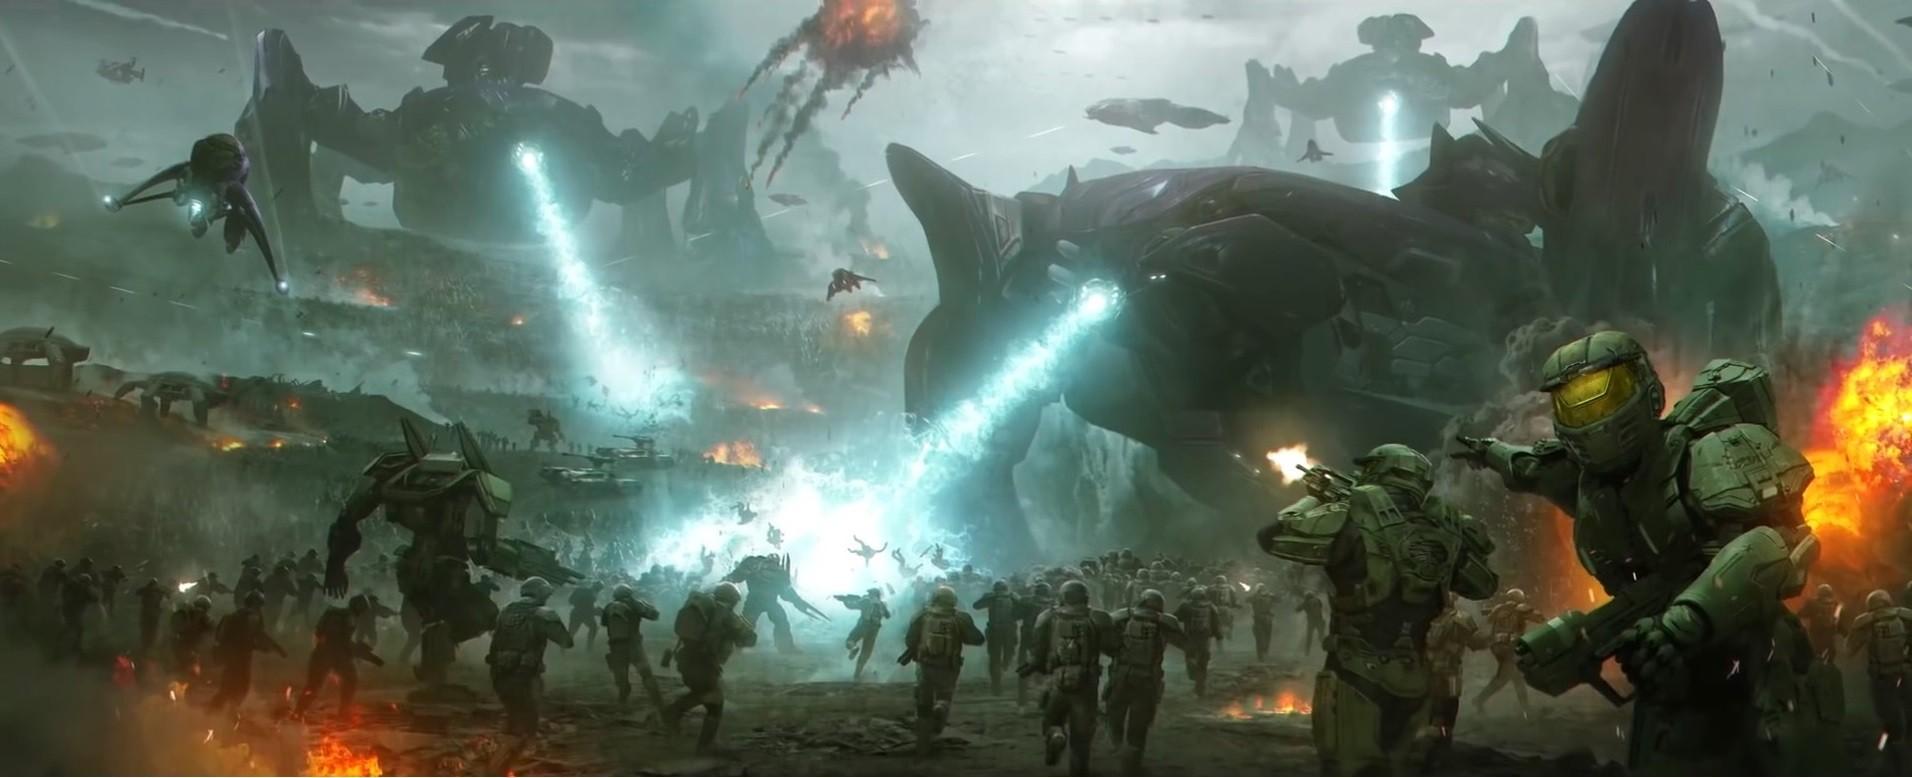 Spartans Halo Games Screenshot Computer Wallpaper Pc Game Wars 2